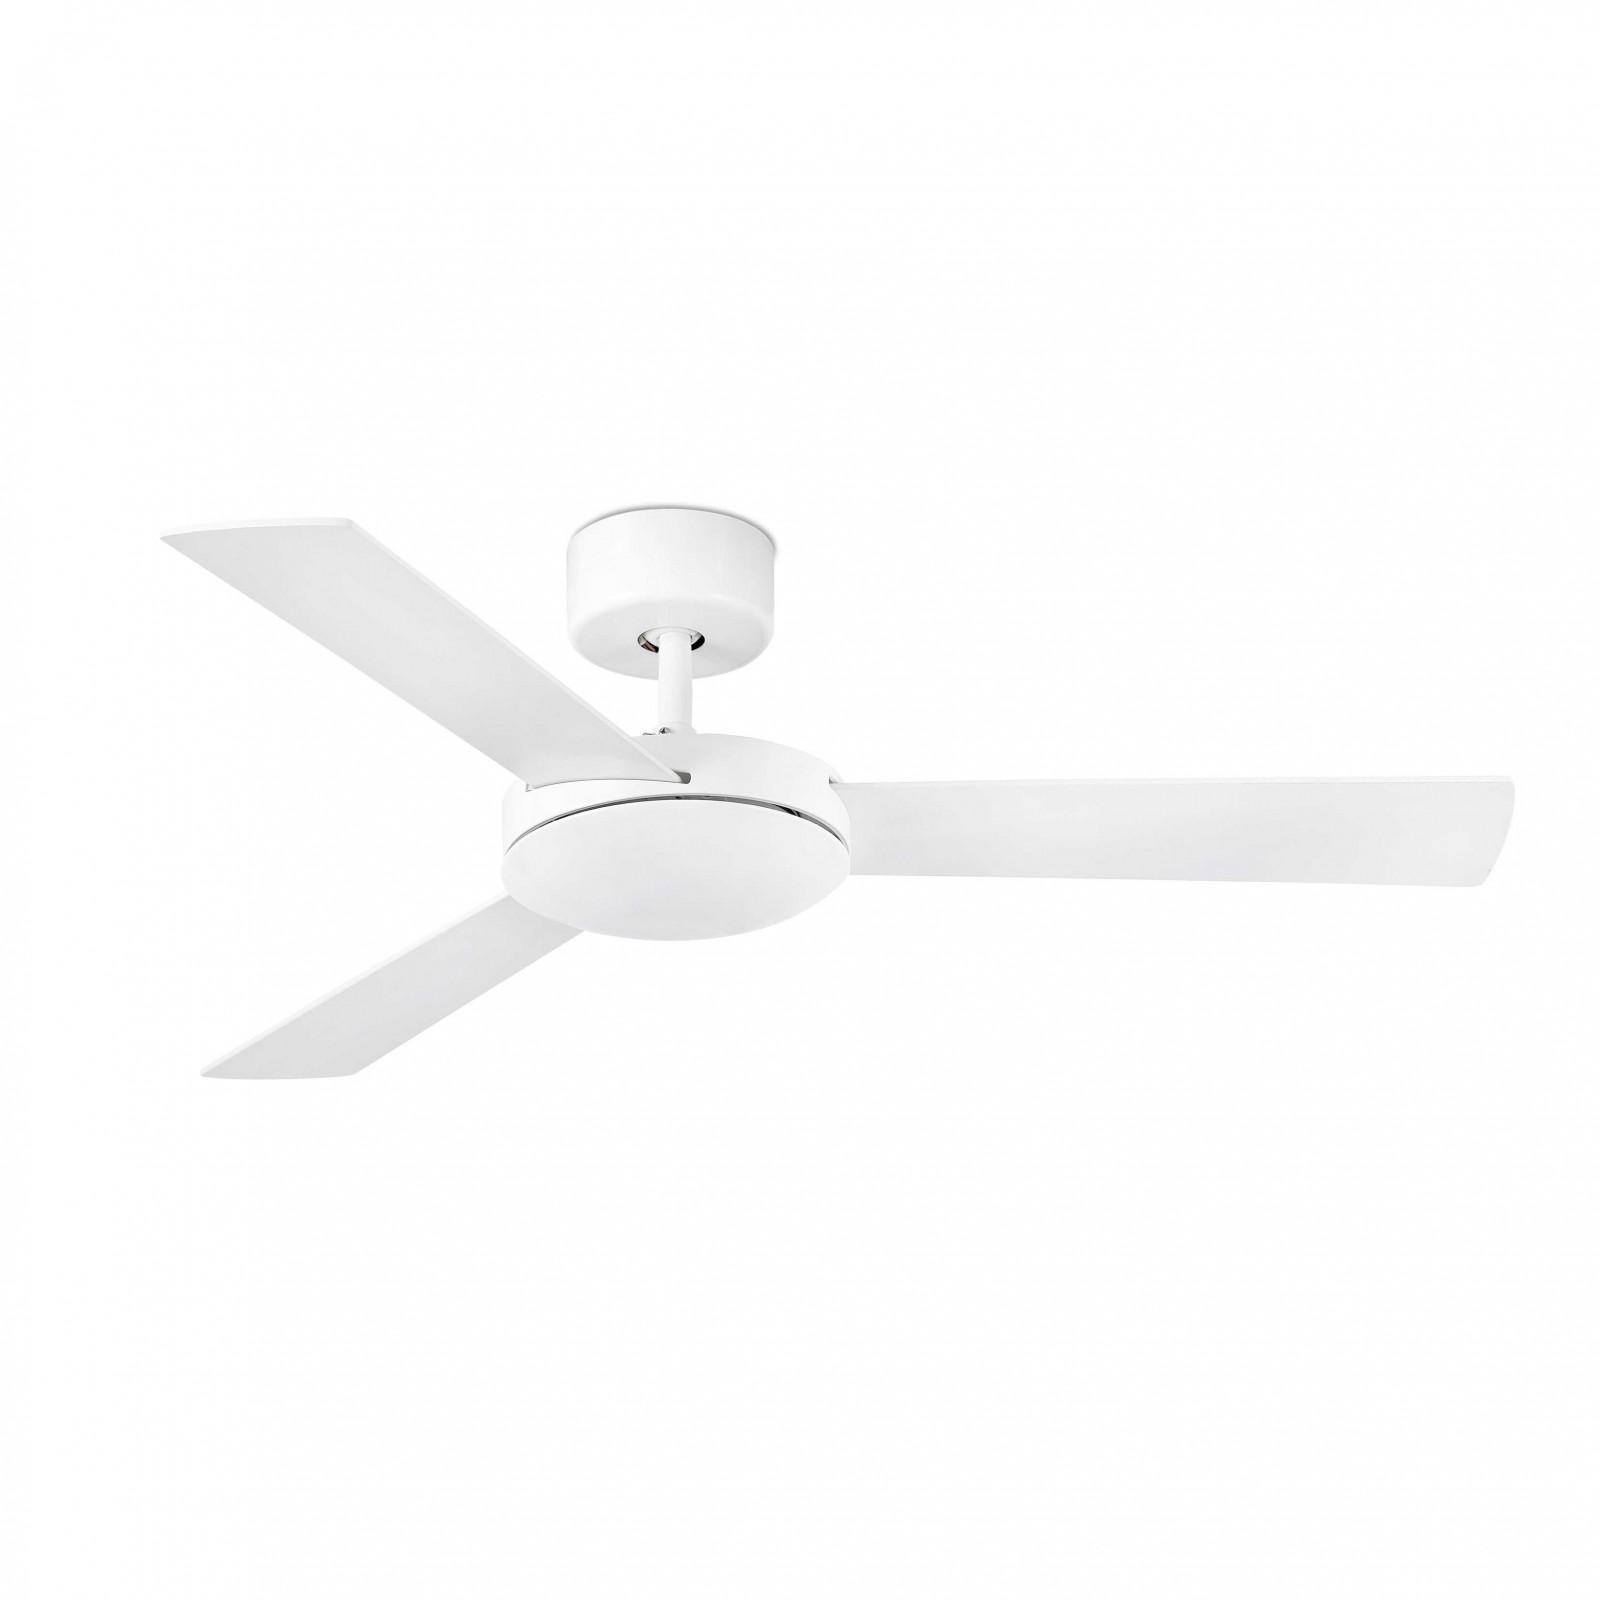 "Faro ceiling fan Mini Mallorca white 106 cm 42"" Ceiling fans for"